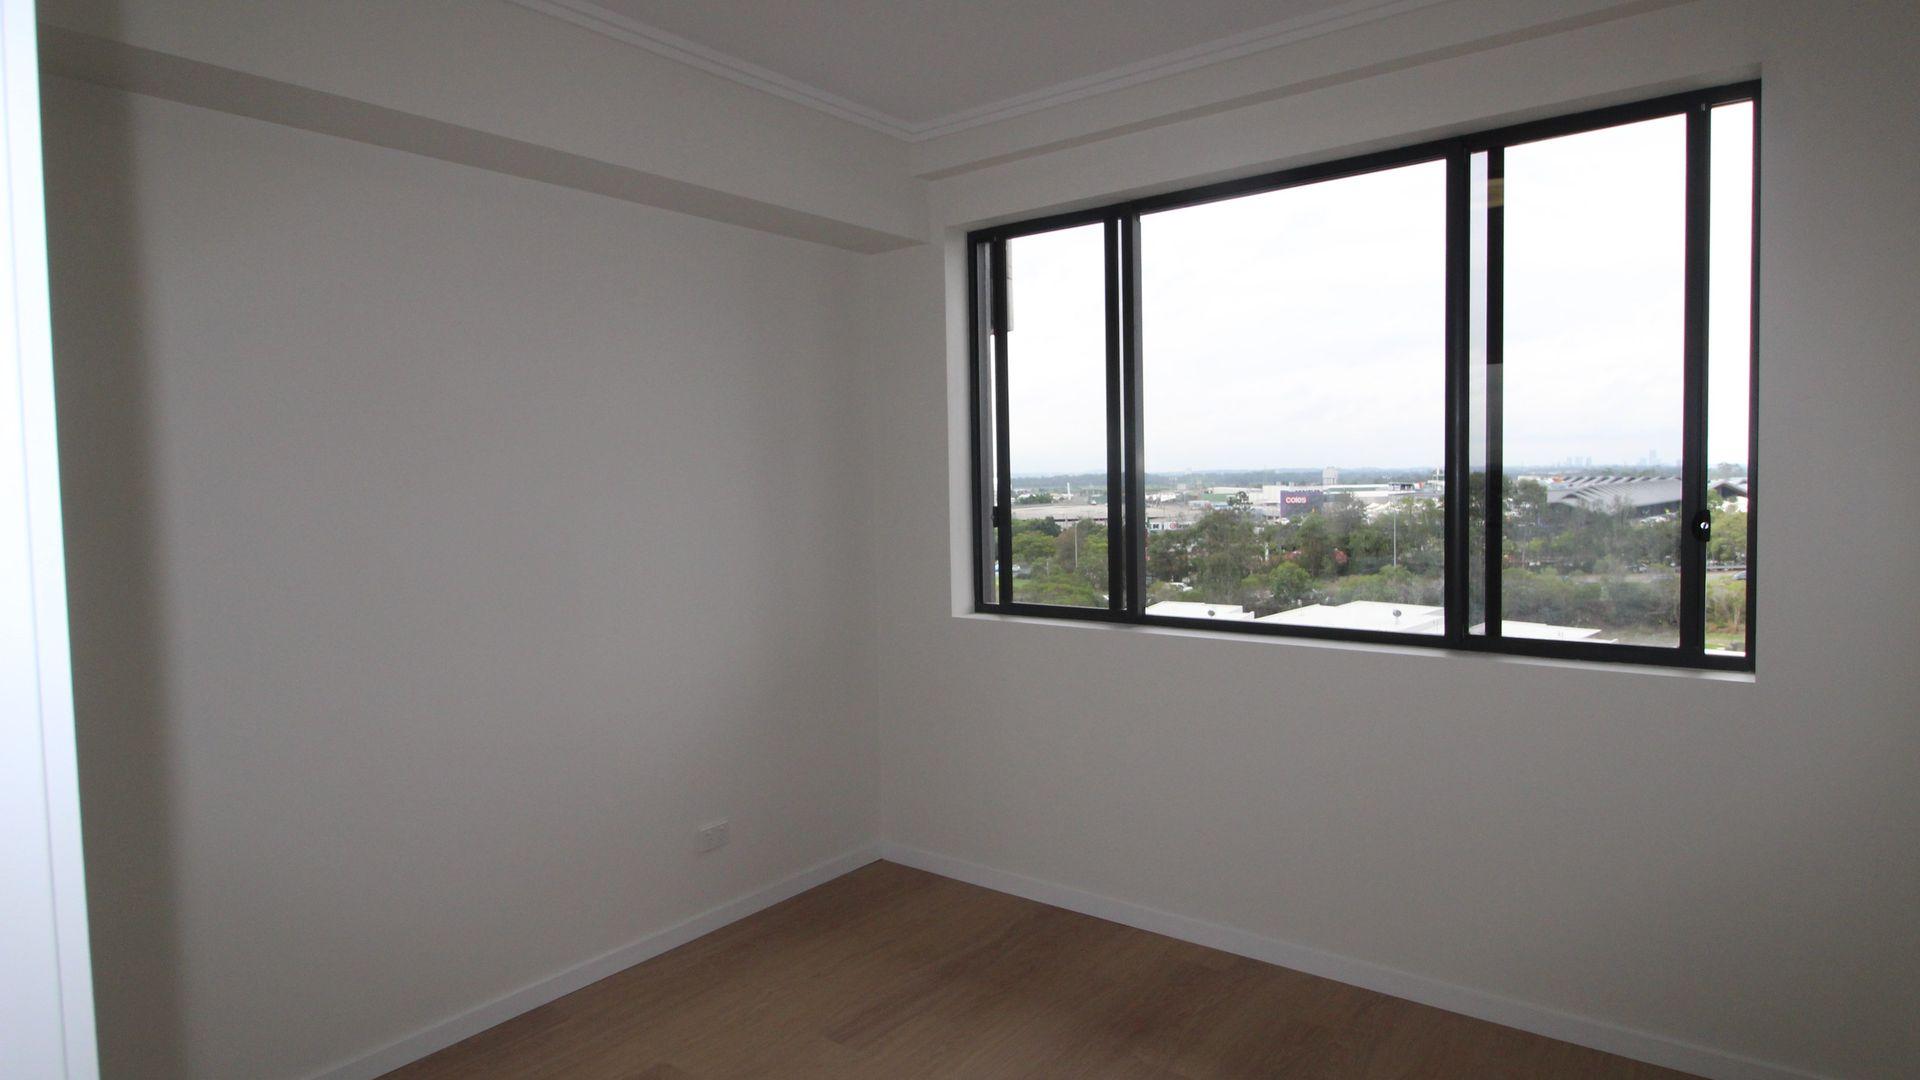 137/25 Parnell Blvd, Robina QLD 4226, Image 7